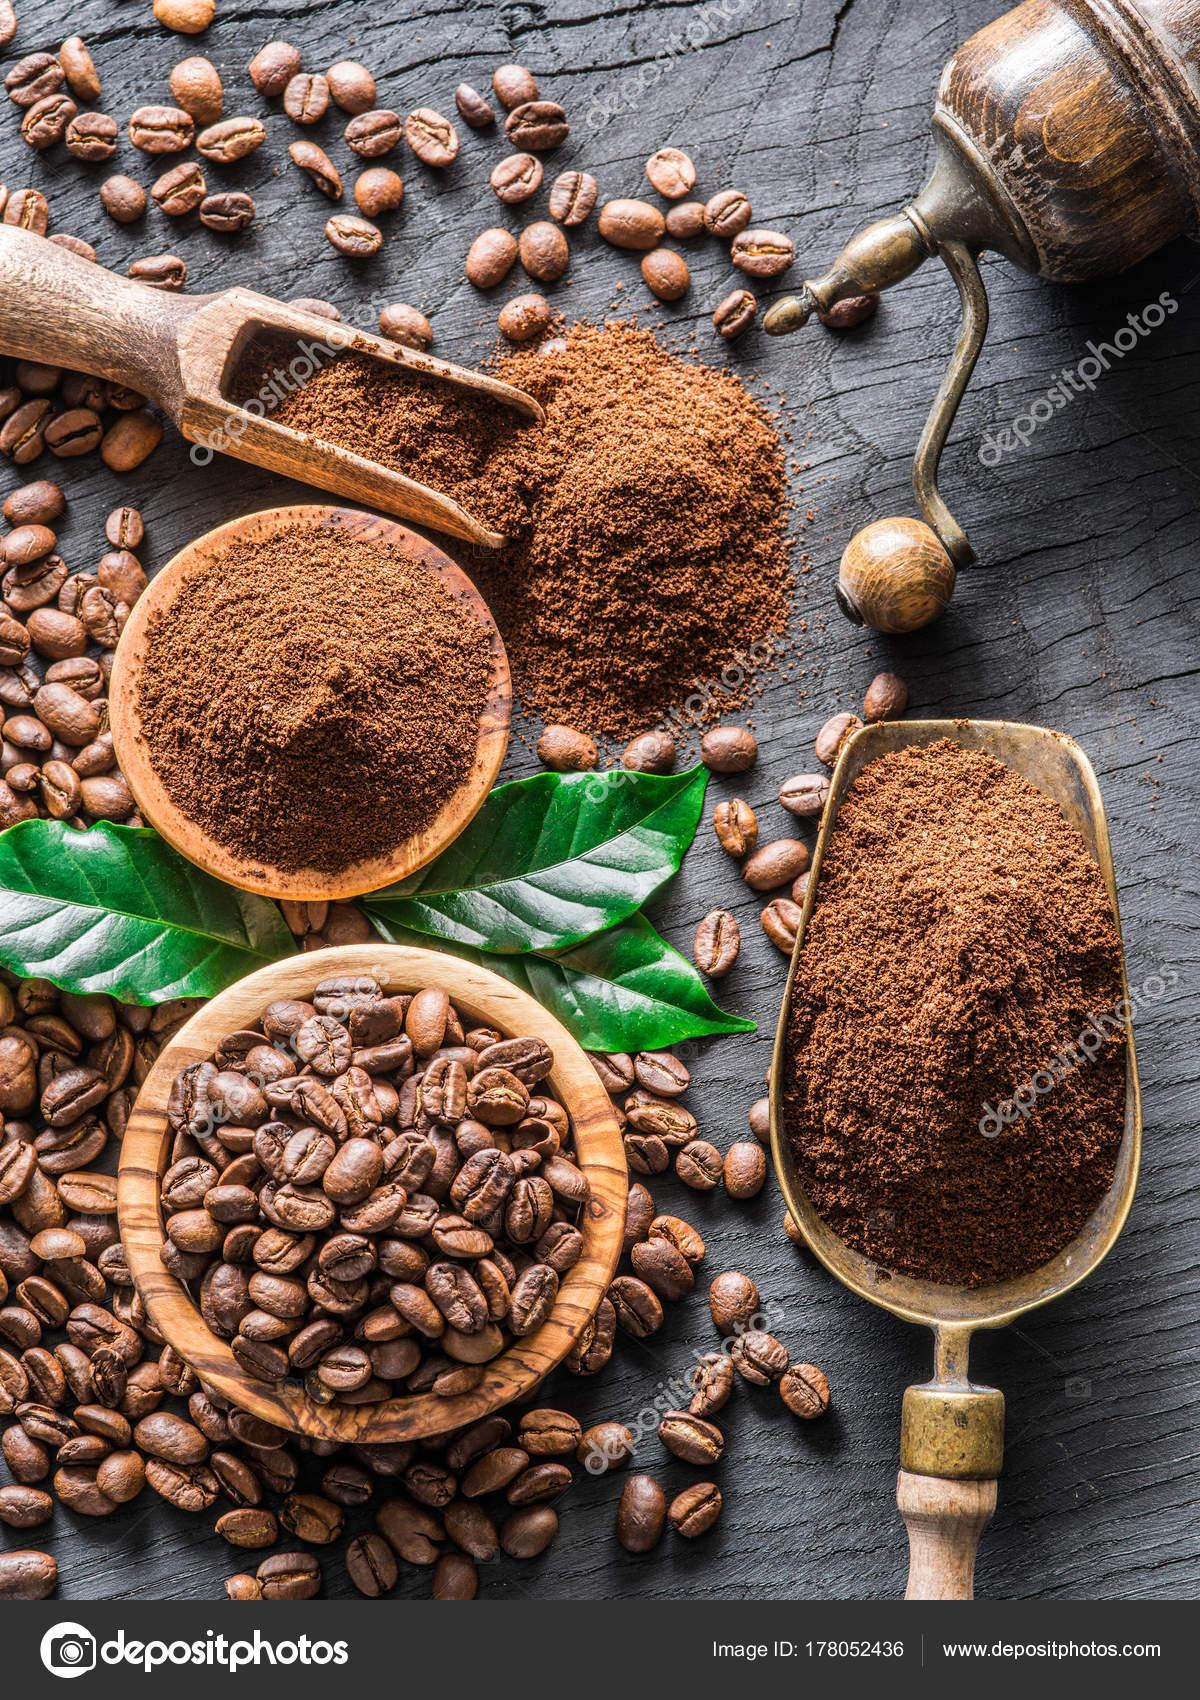 koffiebonen of gemalen koffie